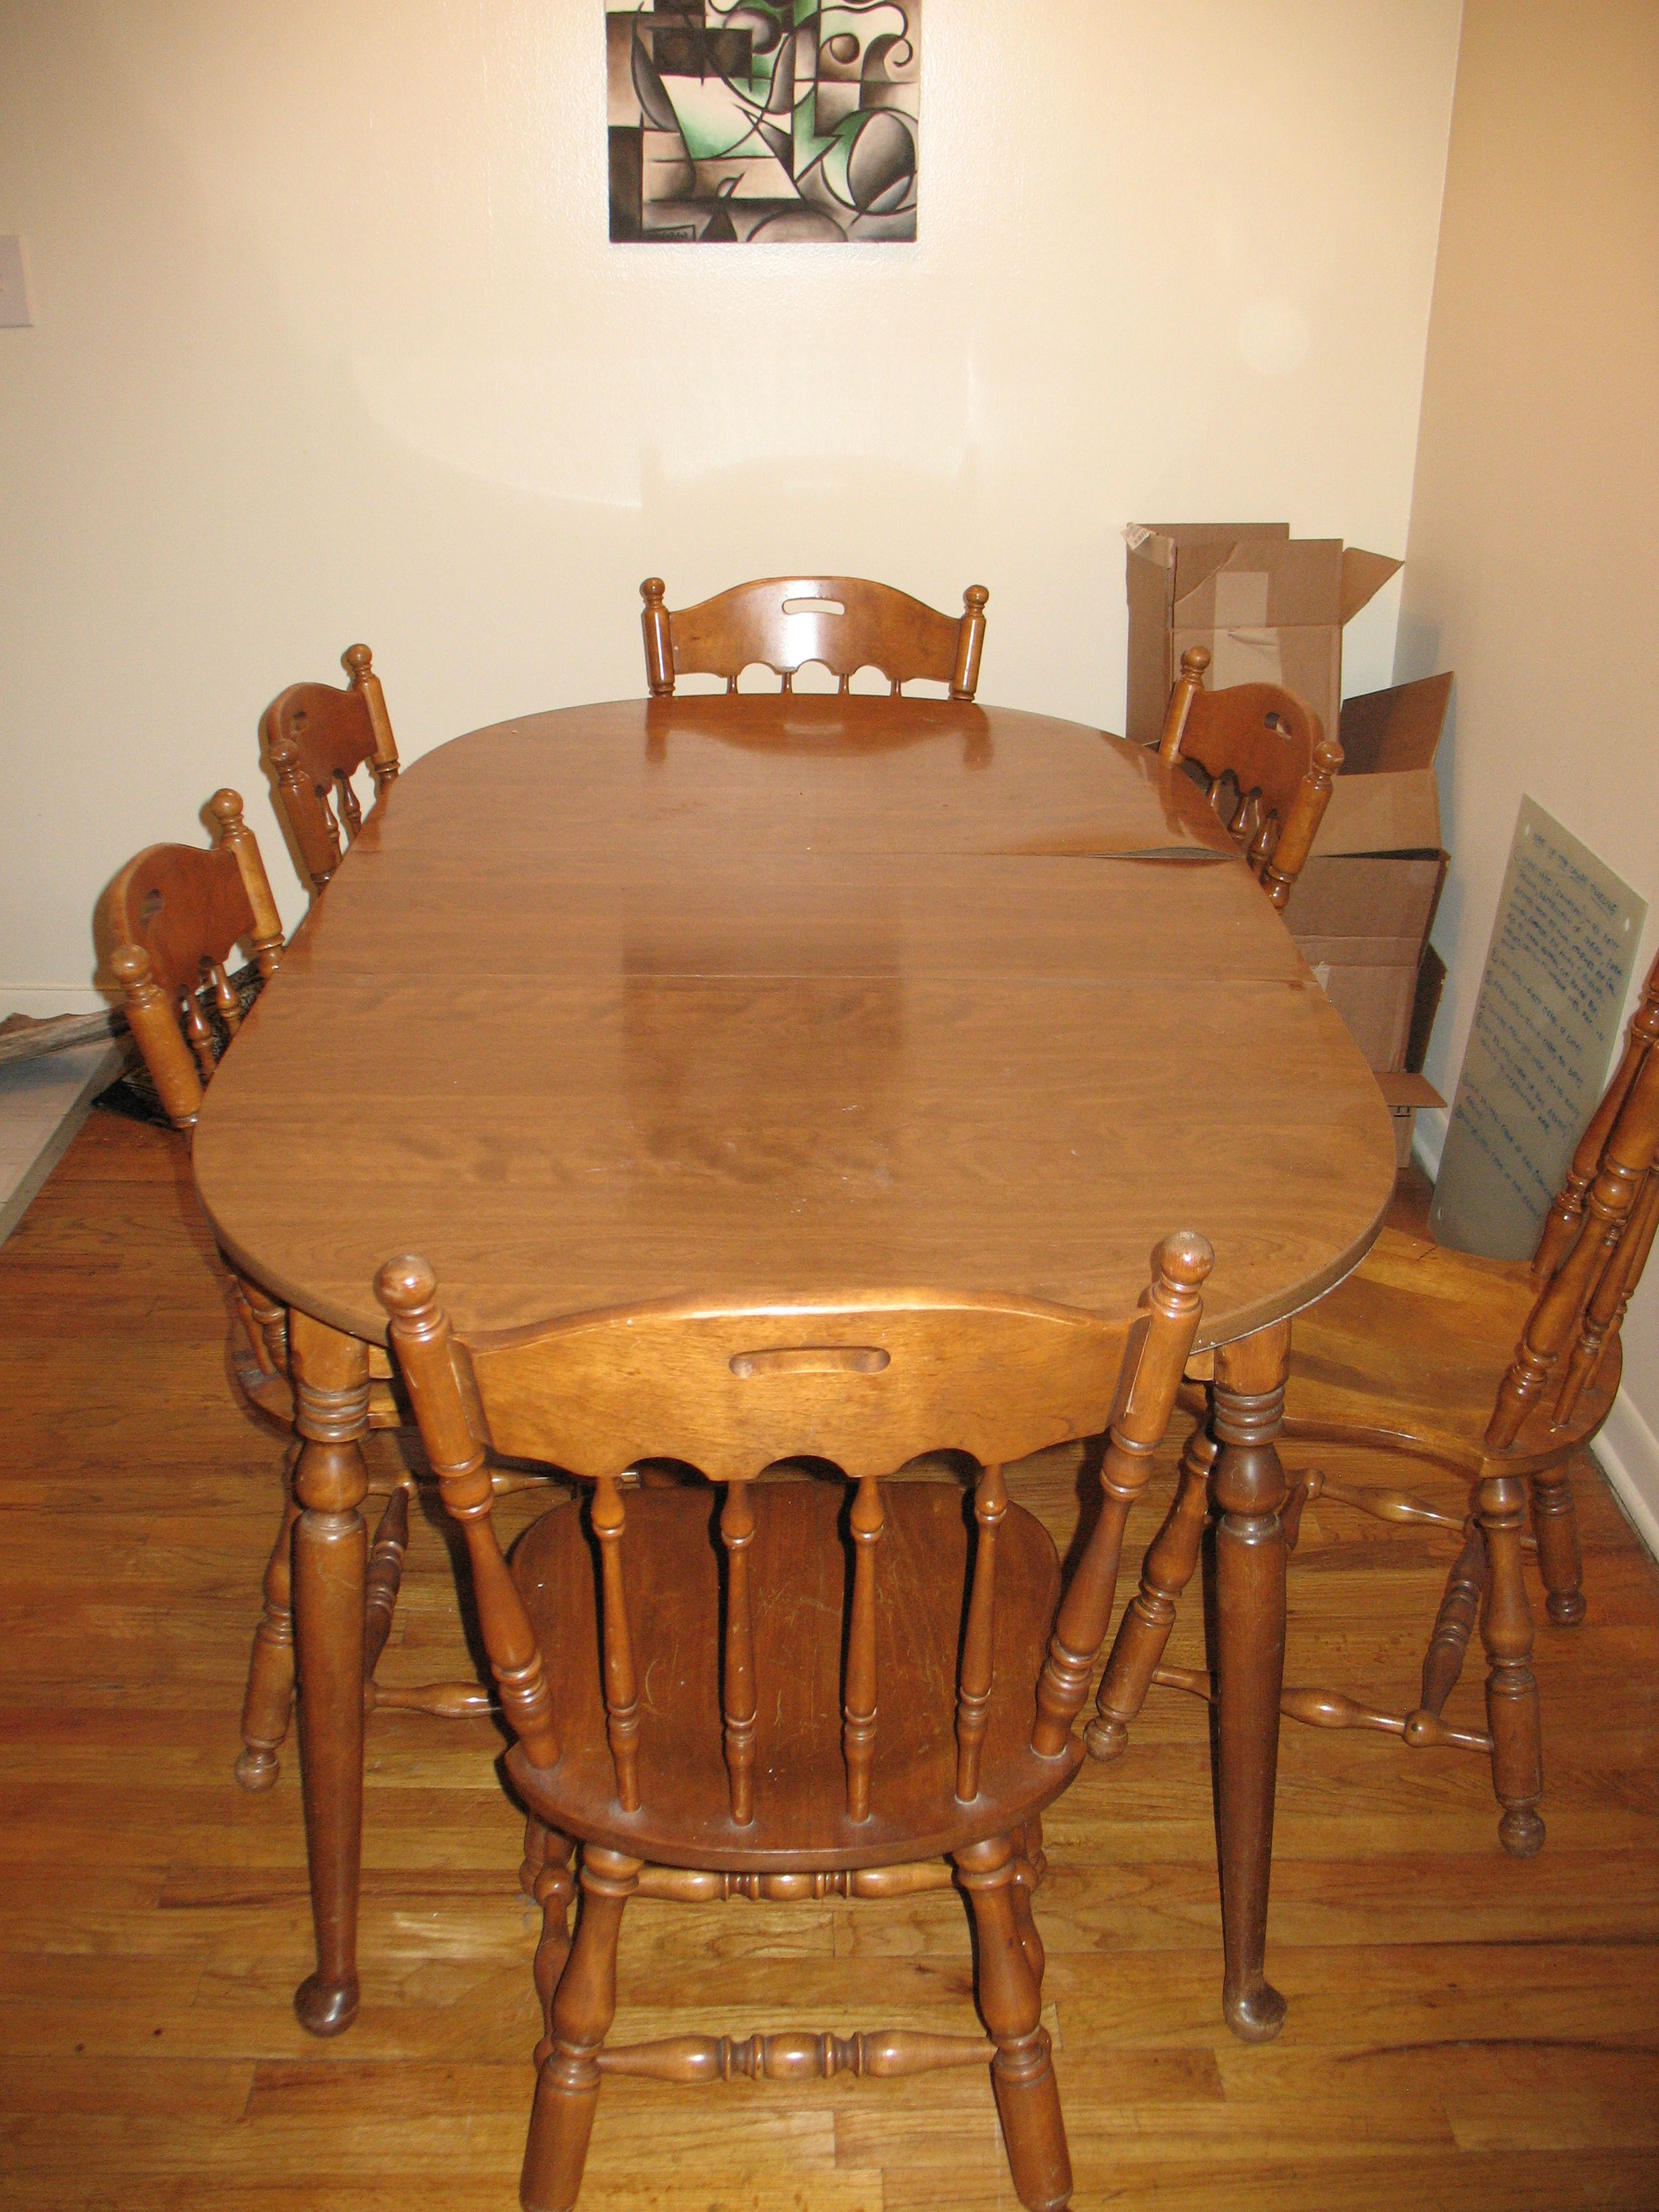 ethan allen table set> OFF 9